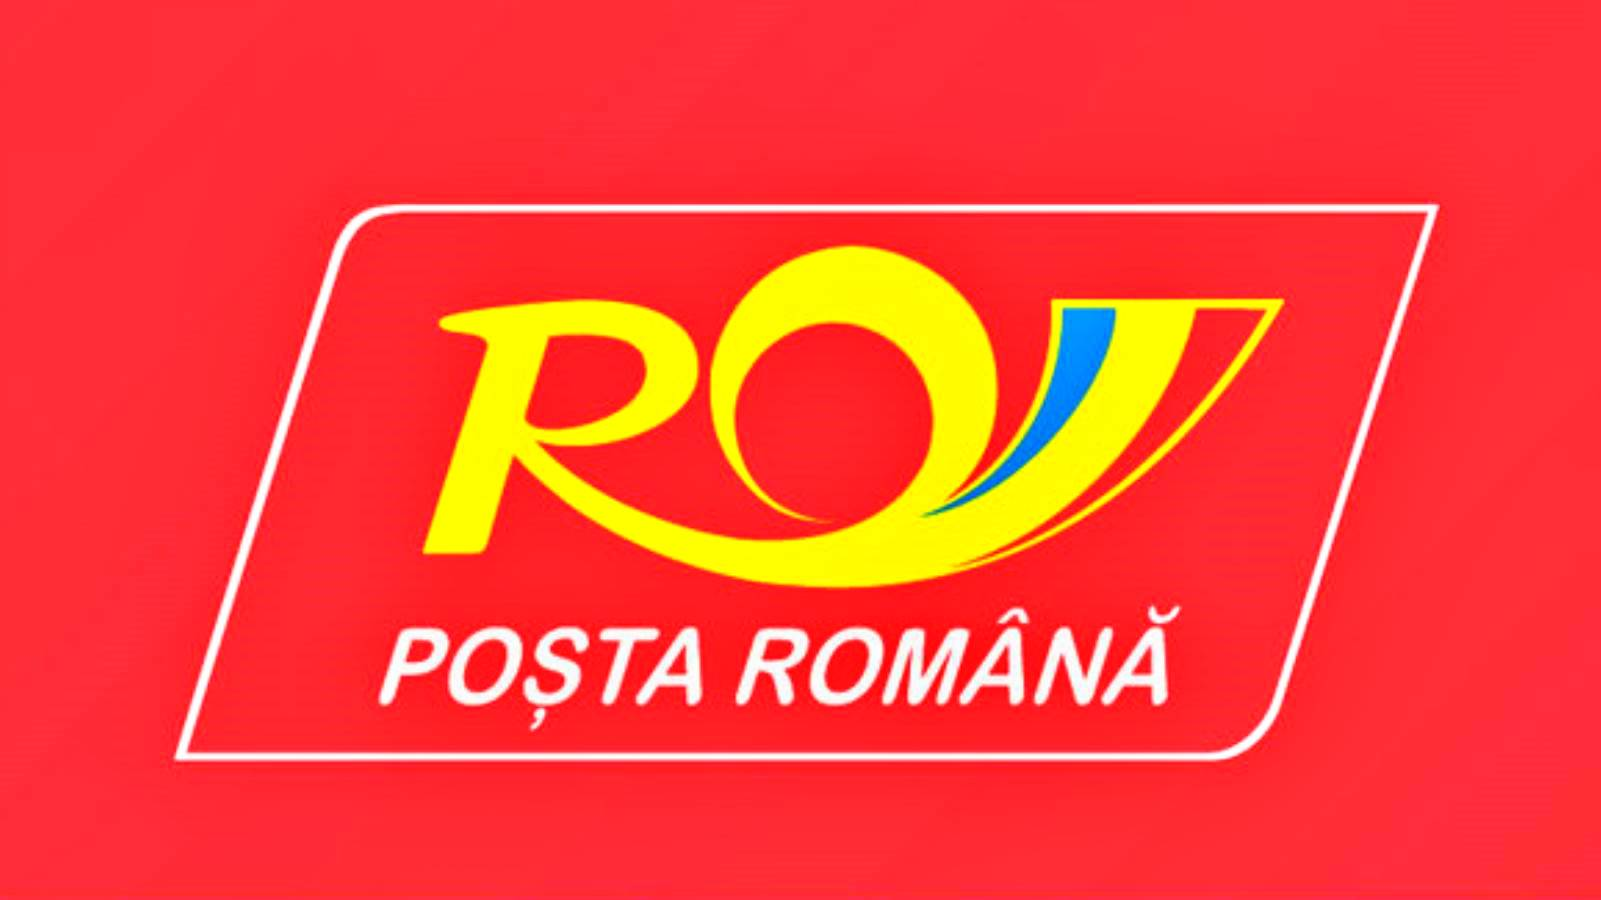 Posta Romana Mesajul Important, ce Nu Stiu Multi Romani